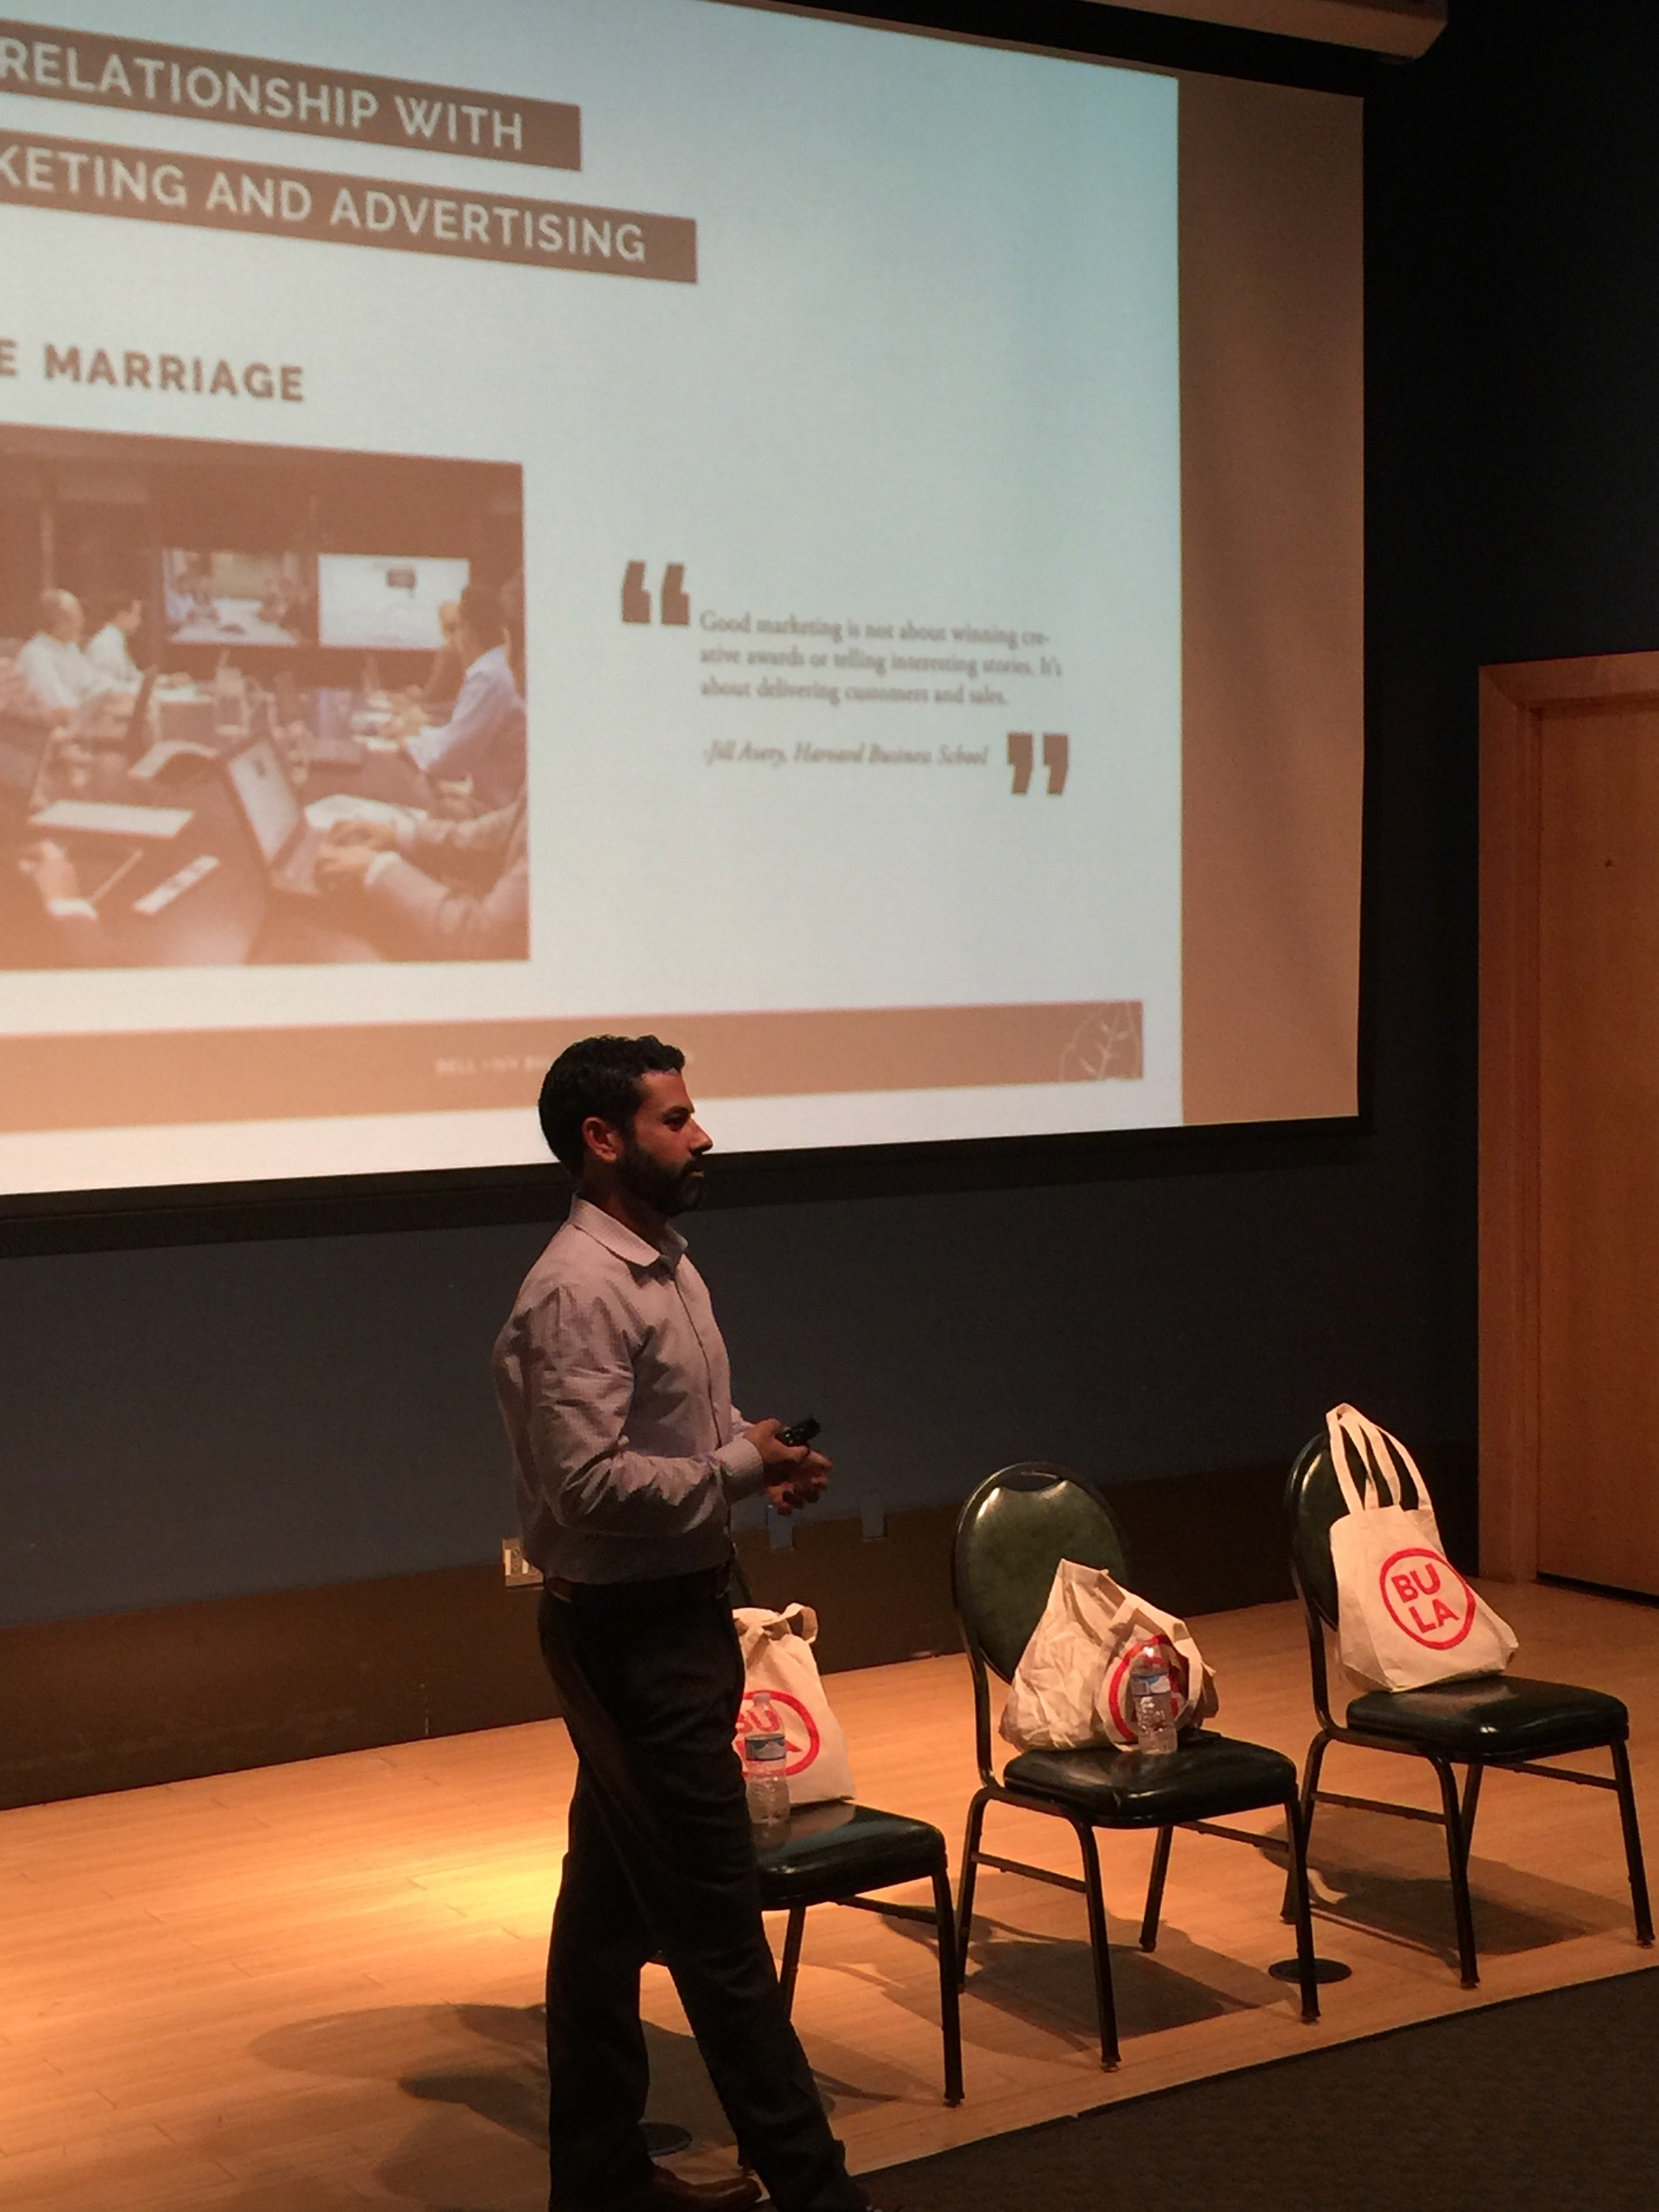 Personal Brand Workshop at Boston University - Zach Binder